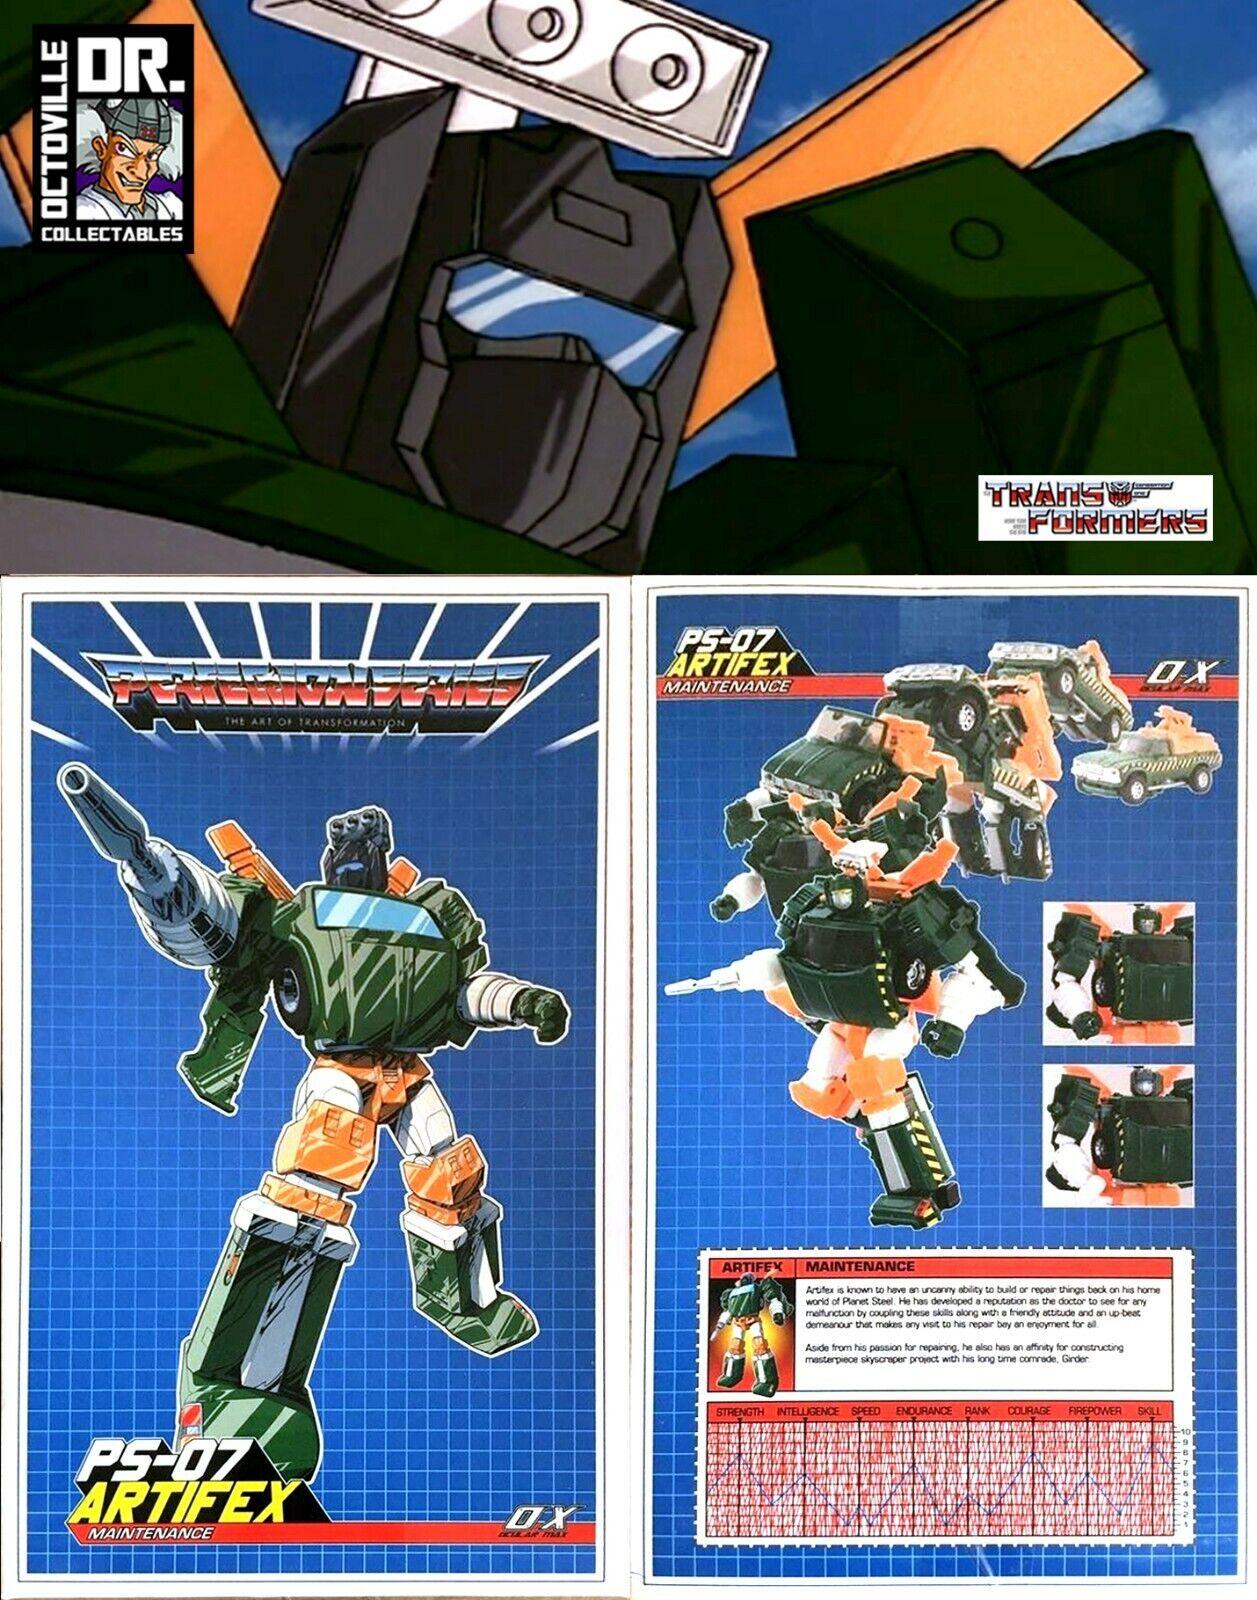 Transformers Masterpiece MMC Ocular Max PS-07 Artifex   MP Hoist Brand New